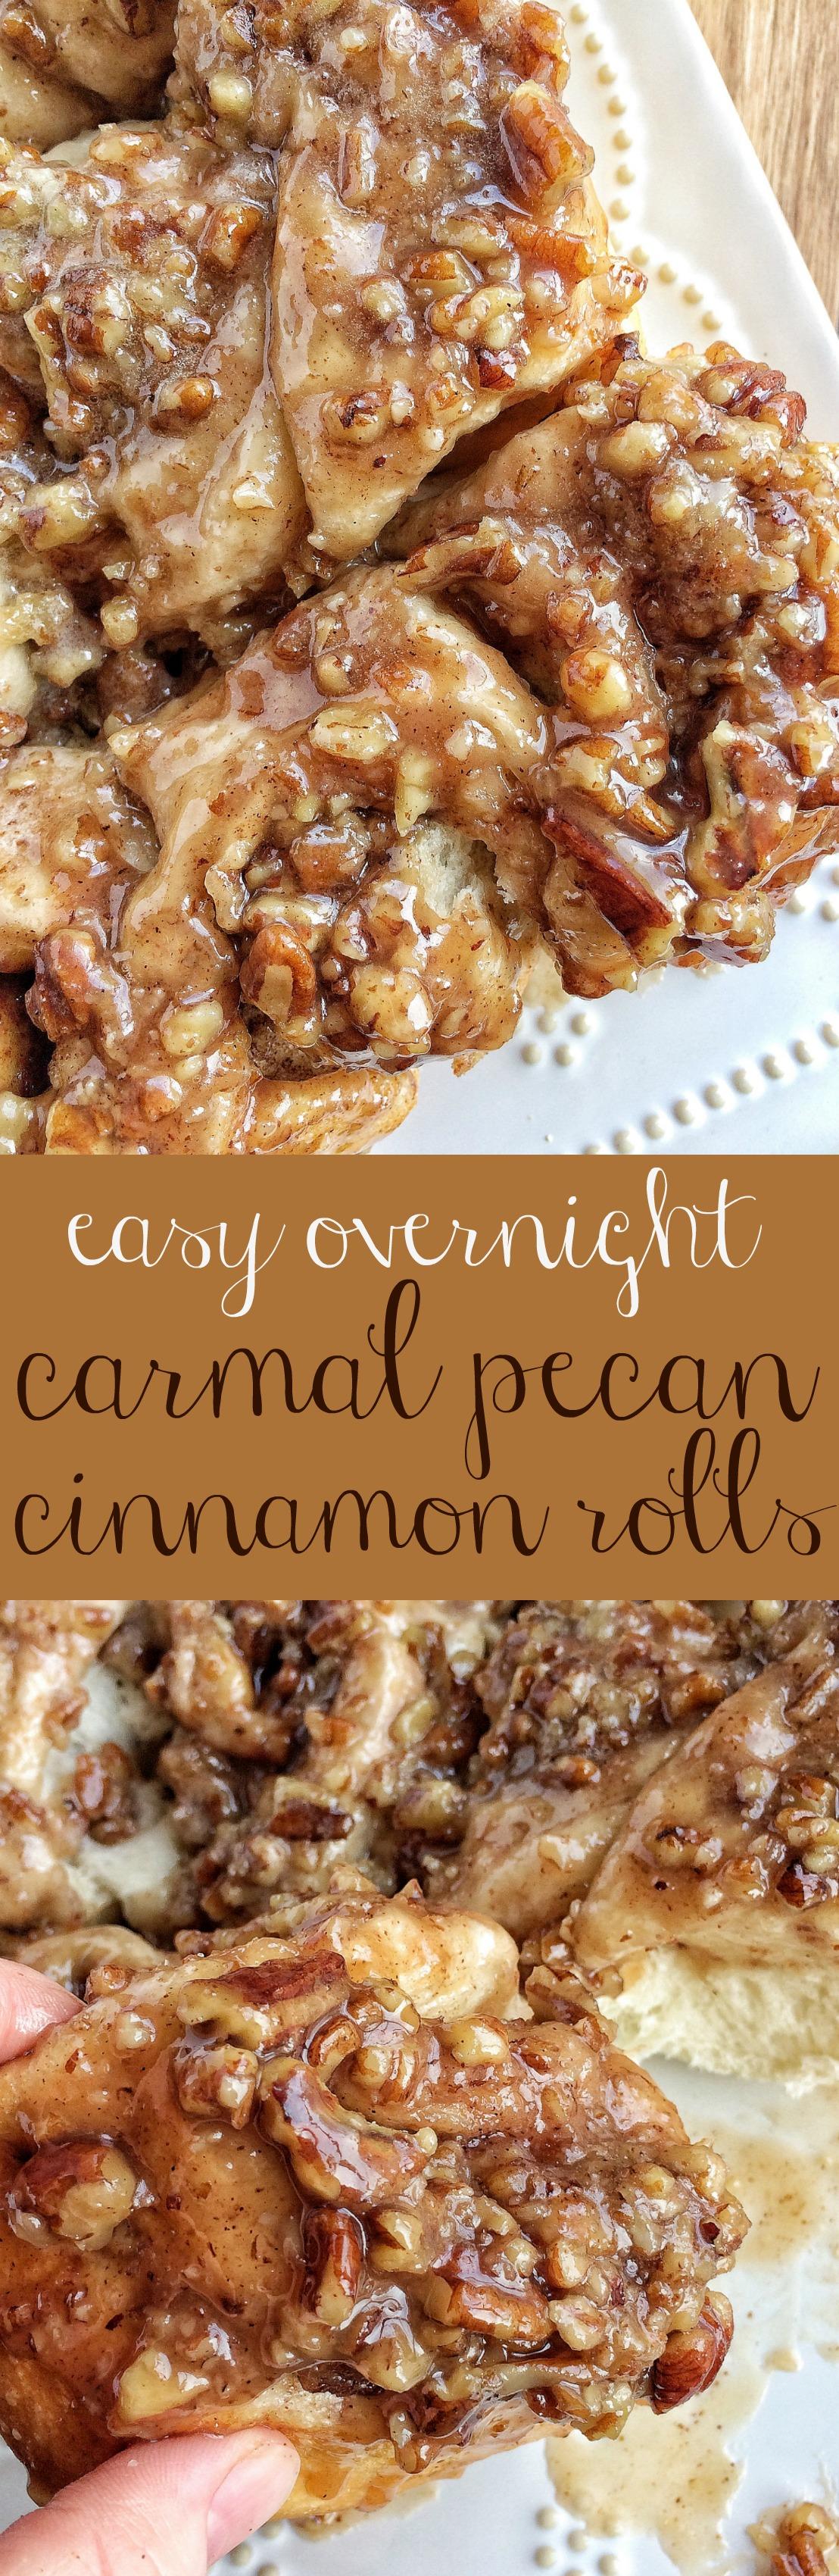 Easy Overnight Caramel Pecan Cinnamon Rolls Together As